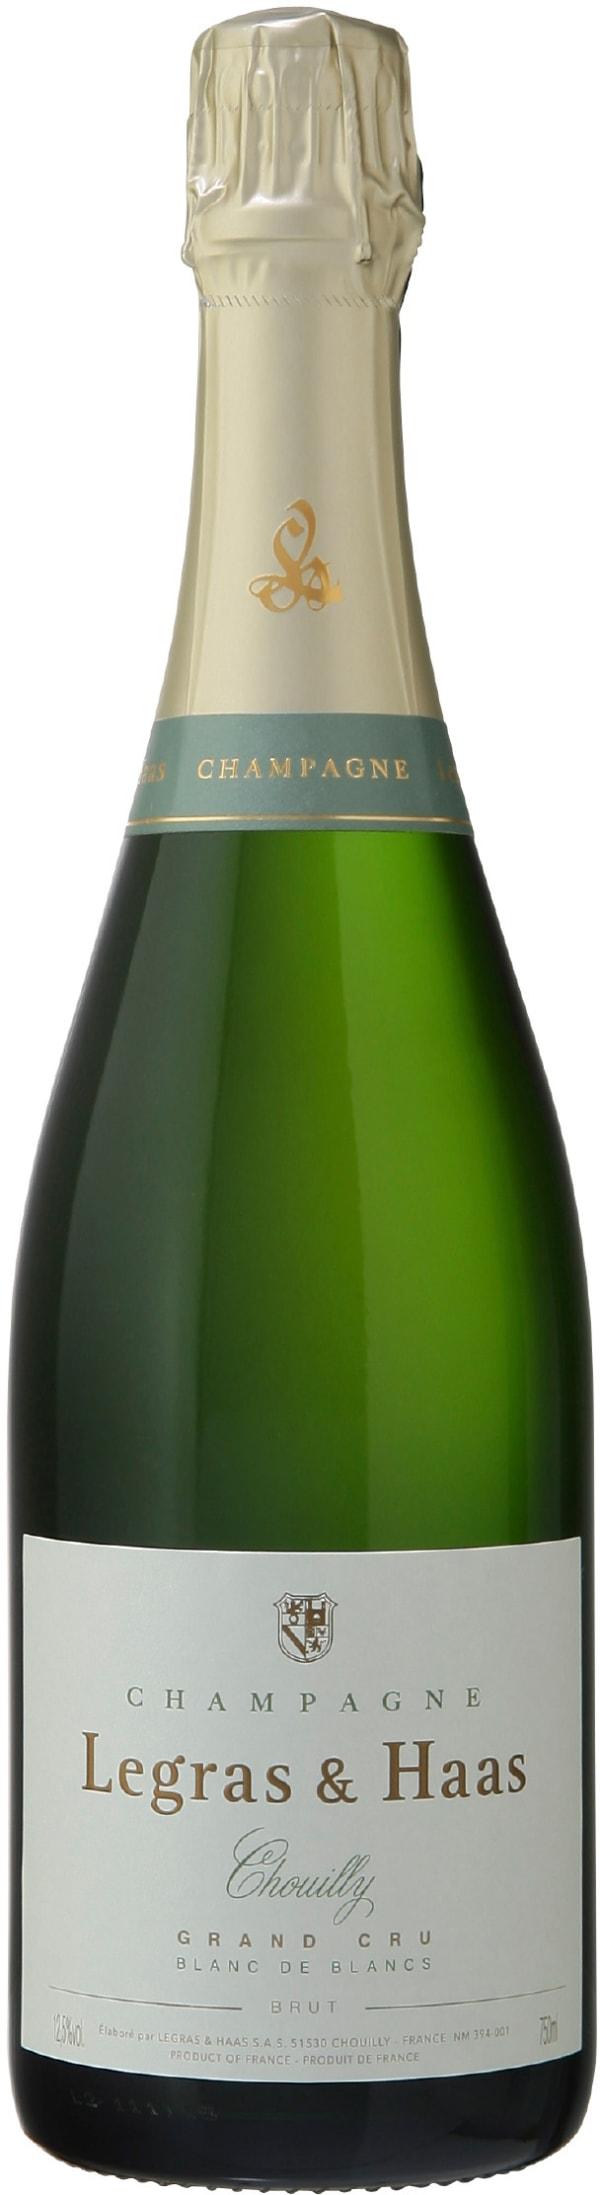 Legras & Haas Chouilly Grand Cru Blanc de Blancs Champagne Brut